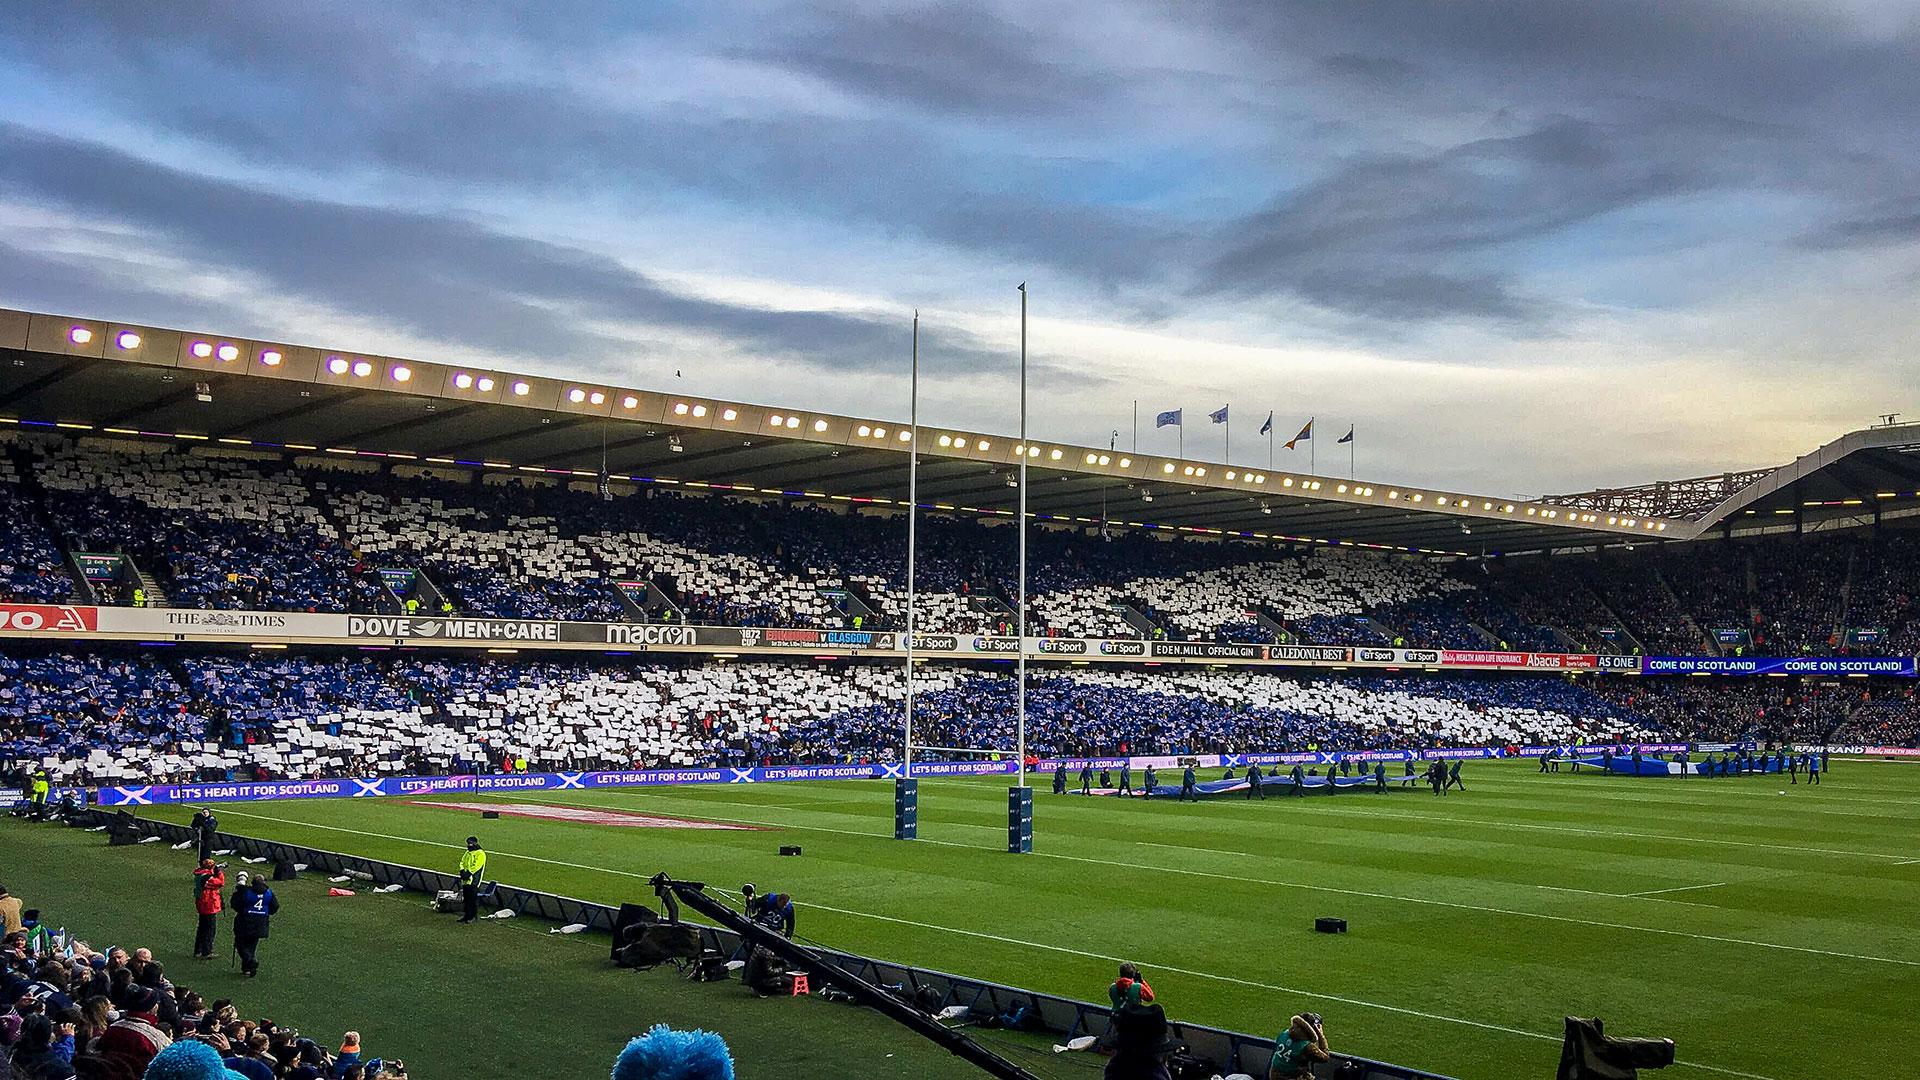 Watch a game of rugby in Edinburgh, Scotland